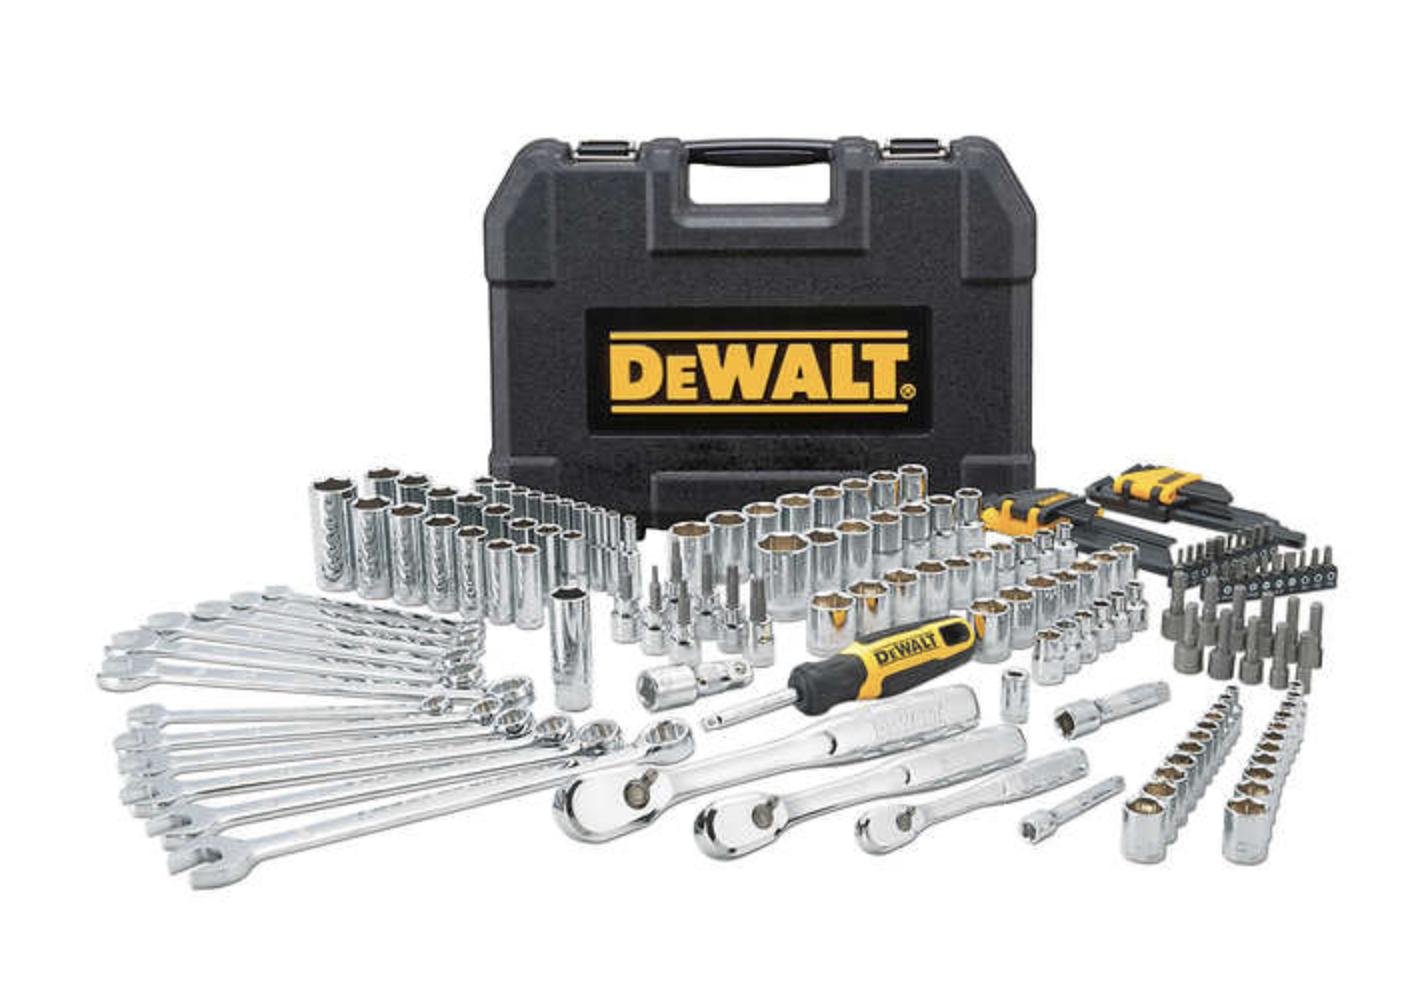 DEWALT 173-piece Polished Chrome Tool Set - $80 at Costco w/ Free ship $79.99